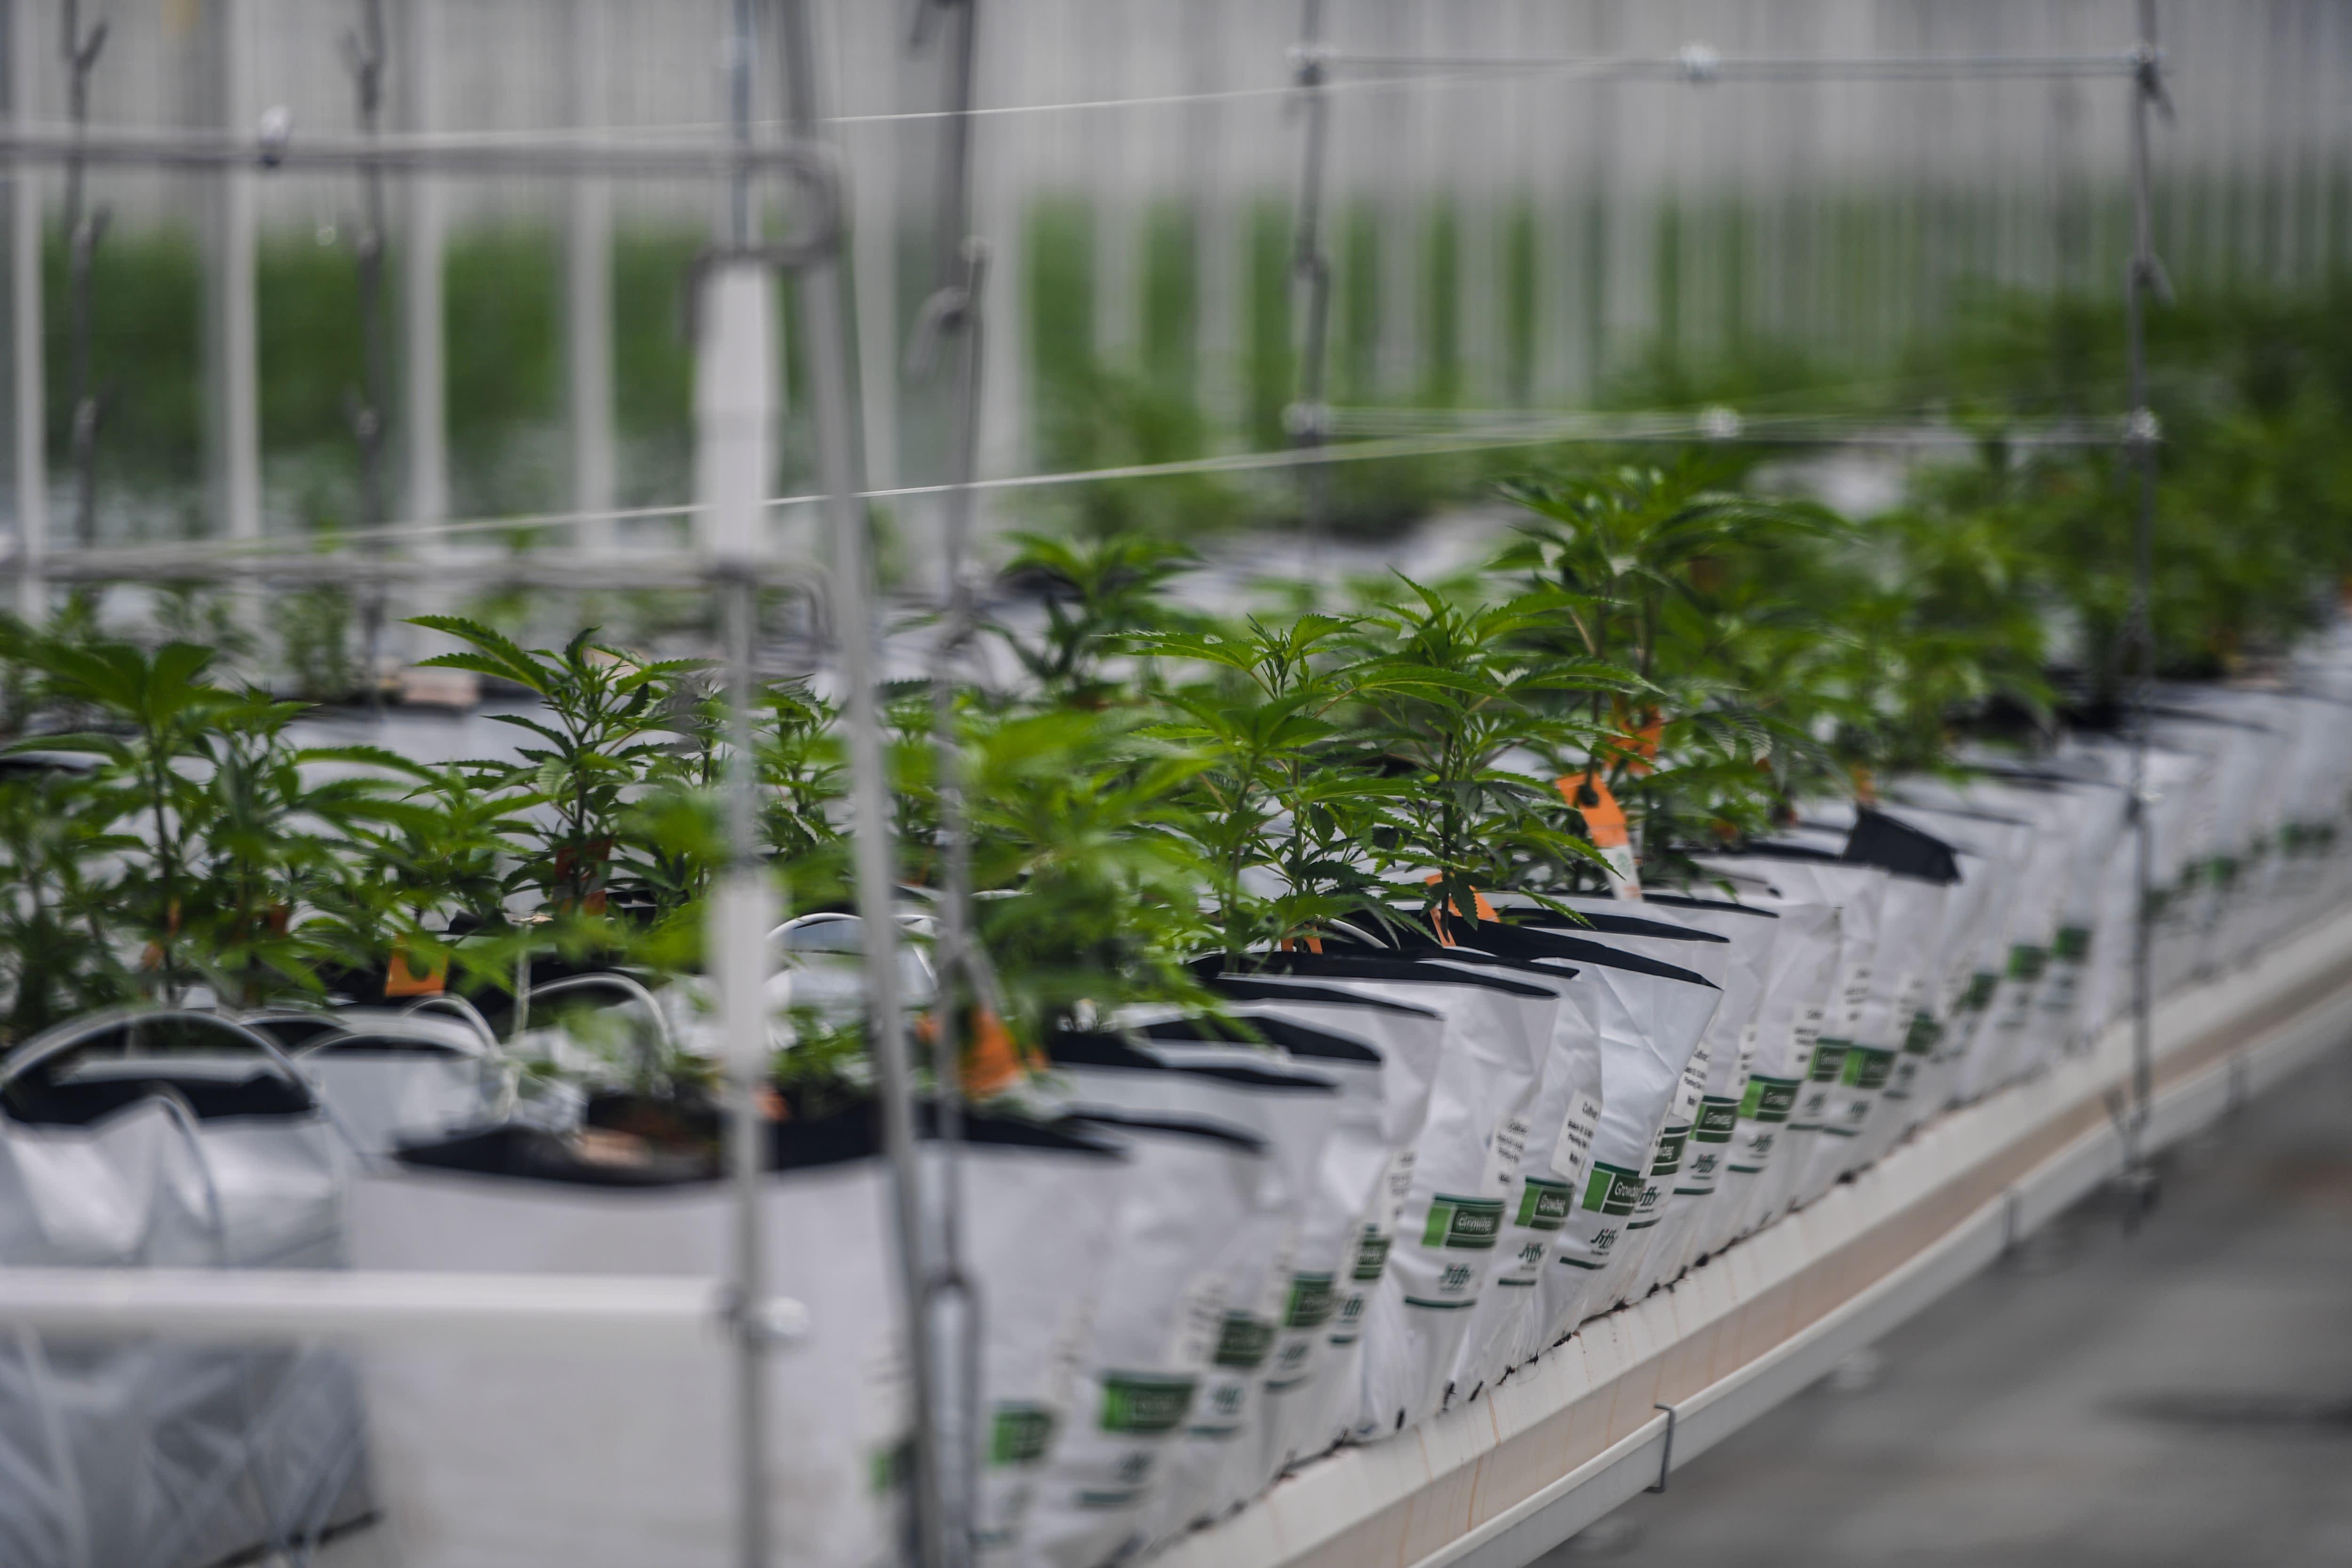 Why one investor is still bullish on Tilray as cannabis sector slumps